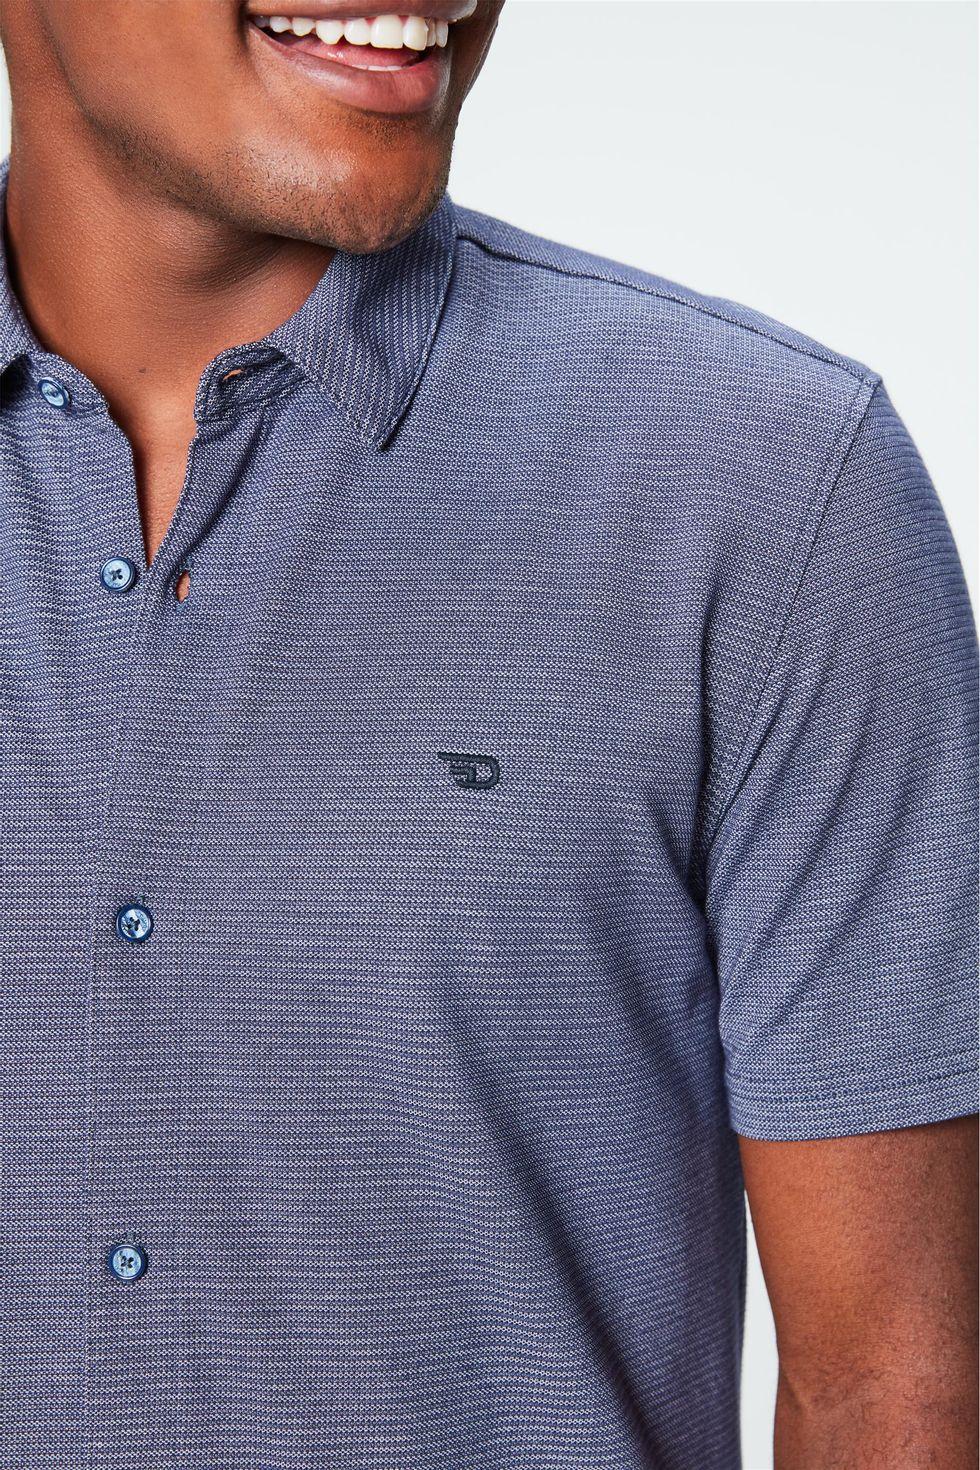 Camisa-de-Algodao-Manga-Curta-Masculina-Frente--